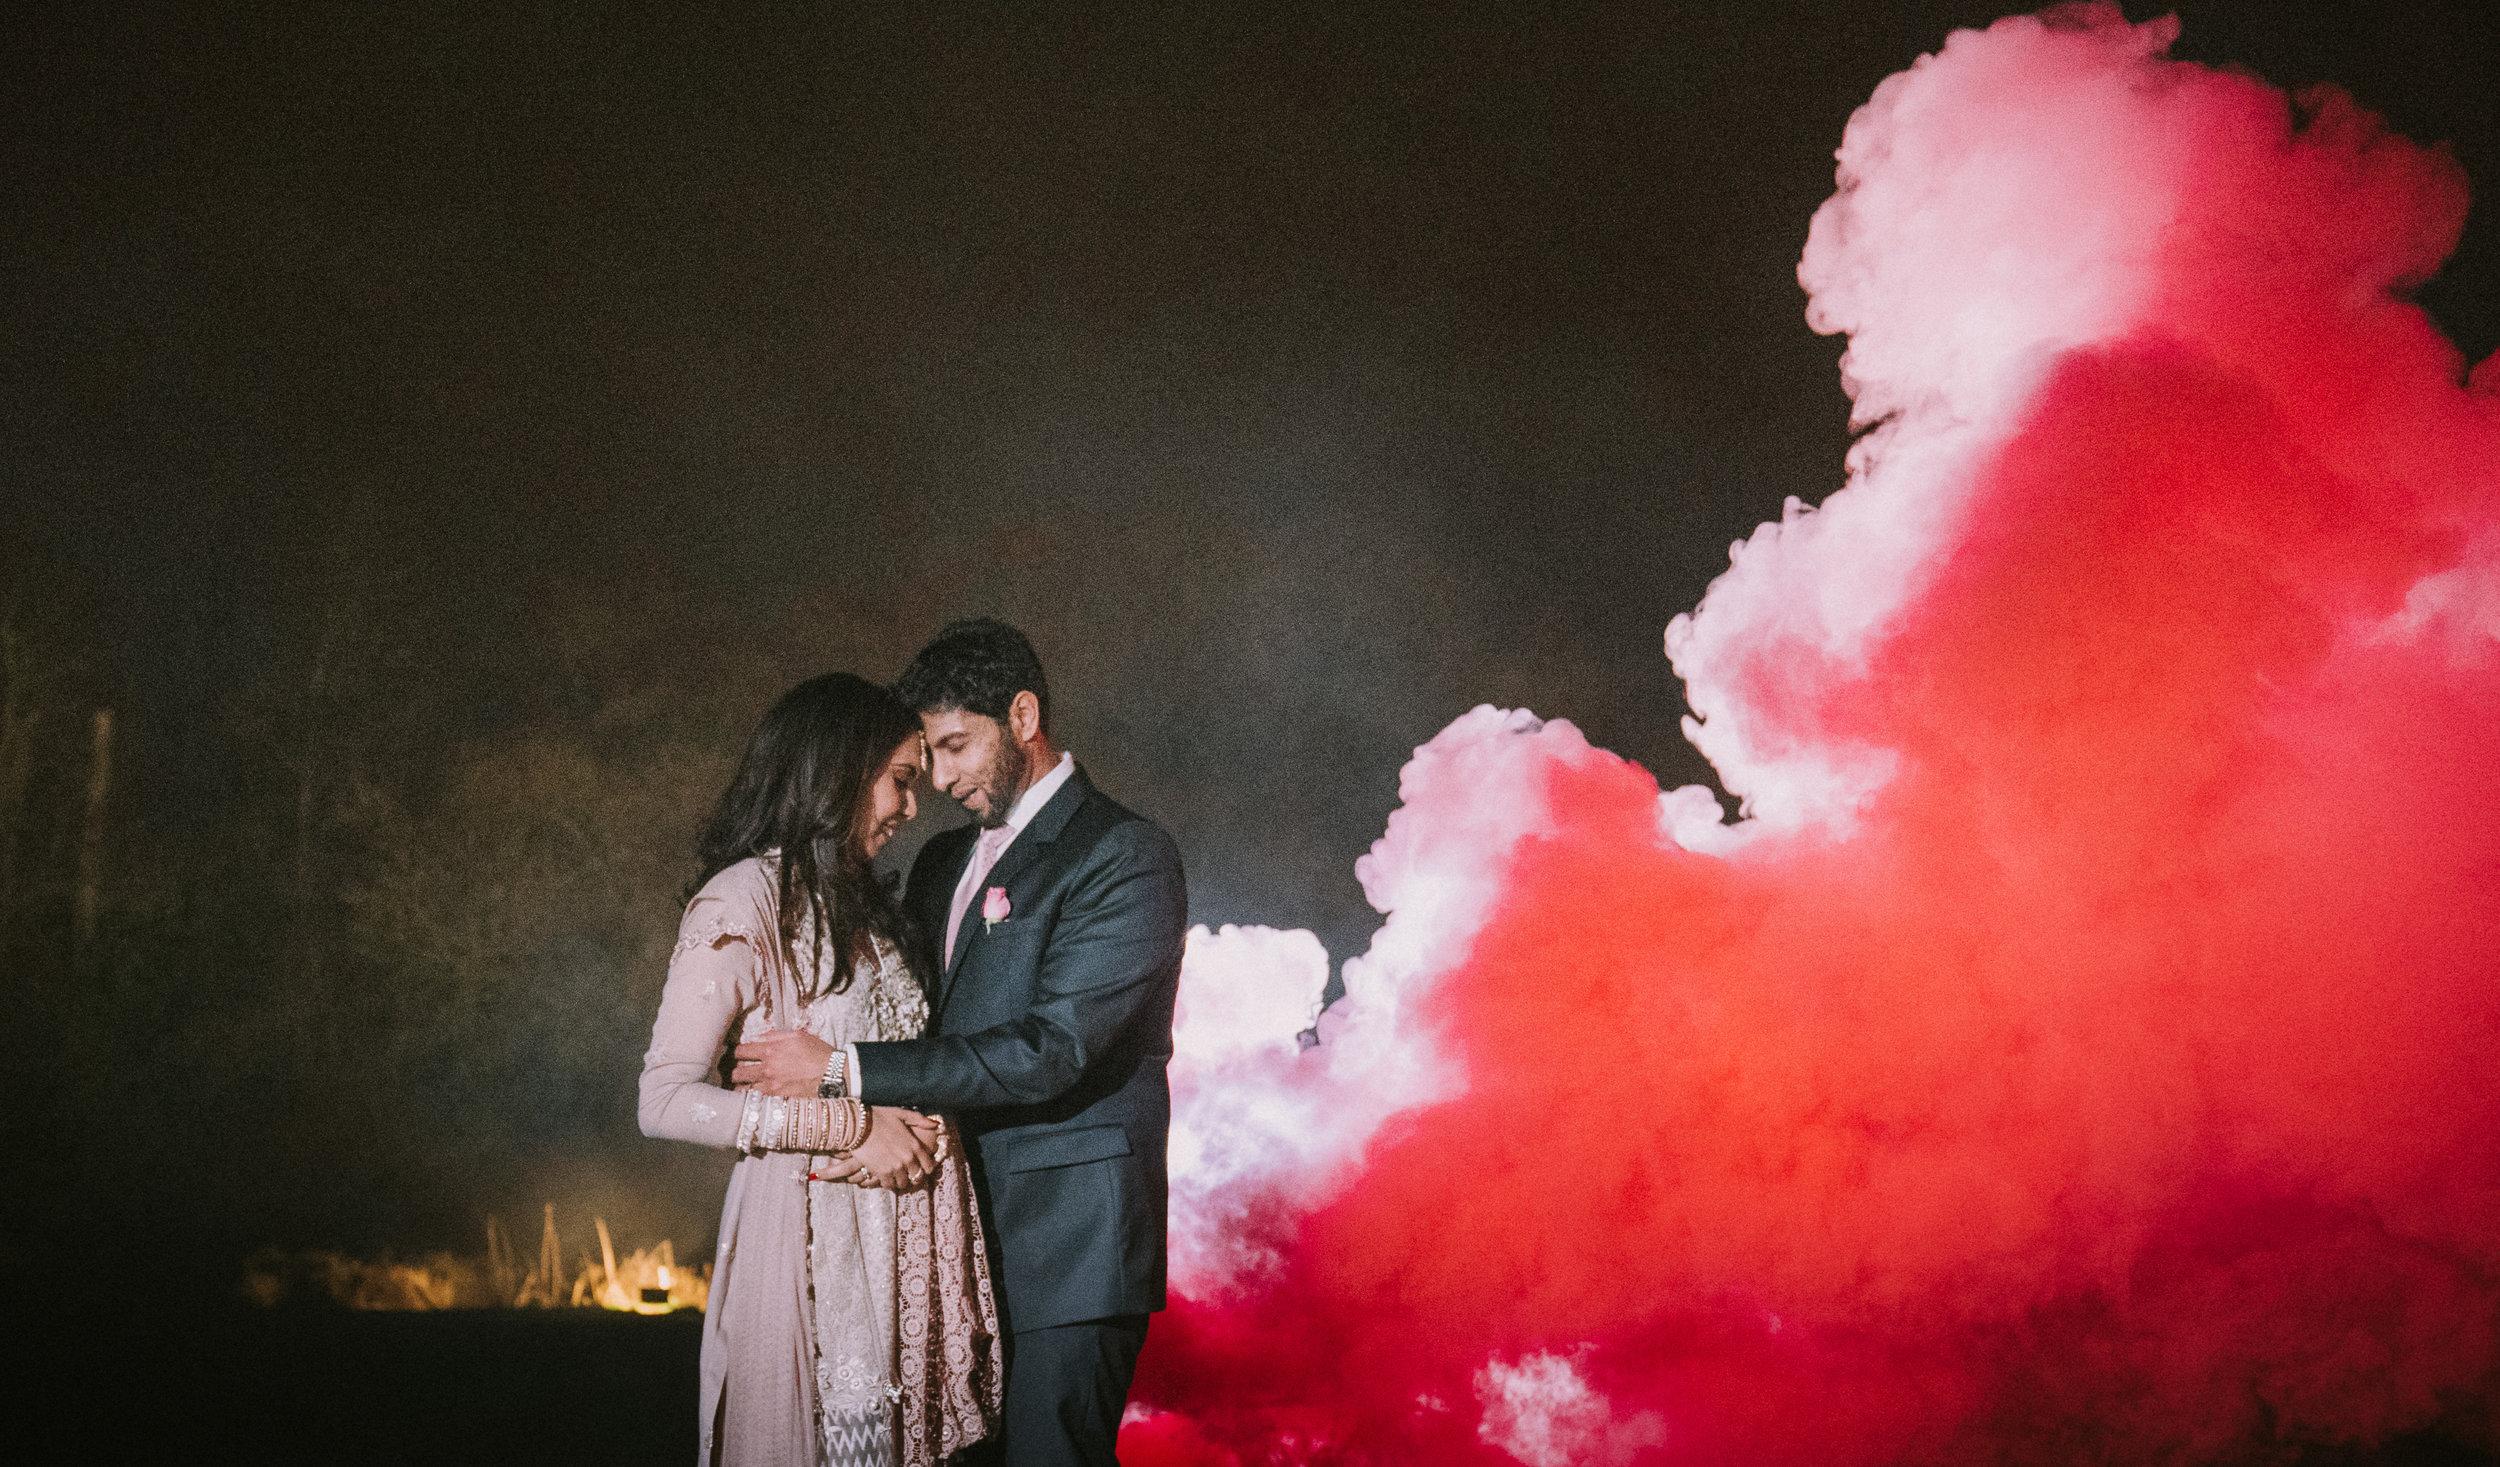 buckinghamshire-golf-club-winter-muslim-wedding-engagement-photography-videography-72